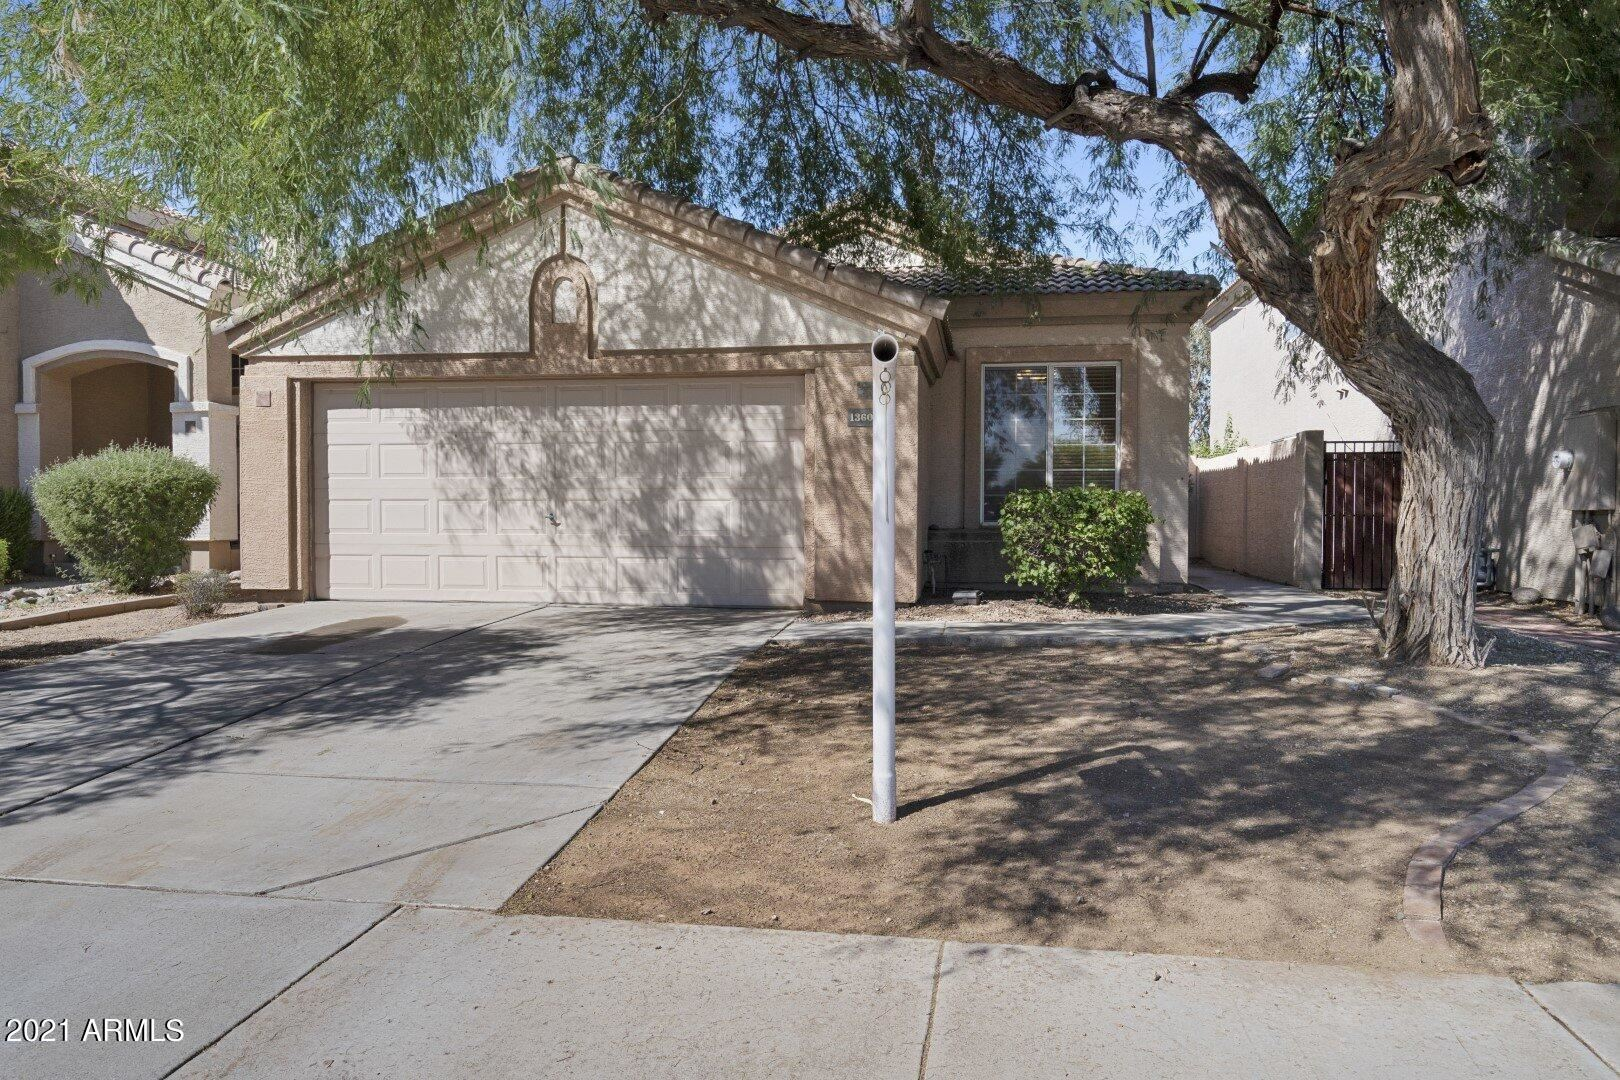 Photo of 13602 W DESERT FLOWER Drive, Goodyear, AZ 85395 (MLS # 6295816)